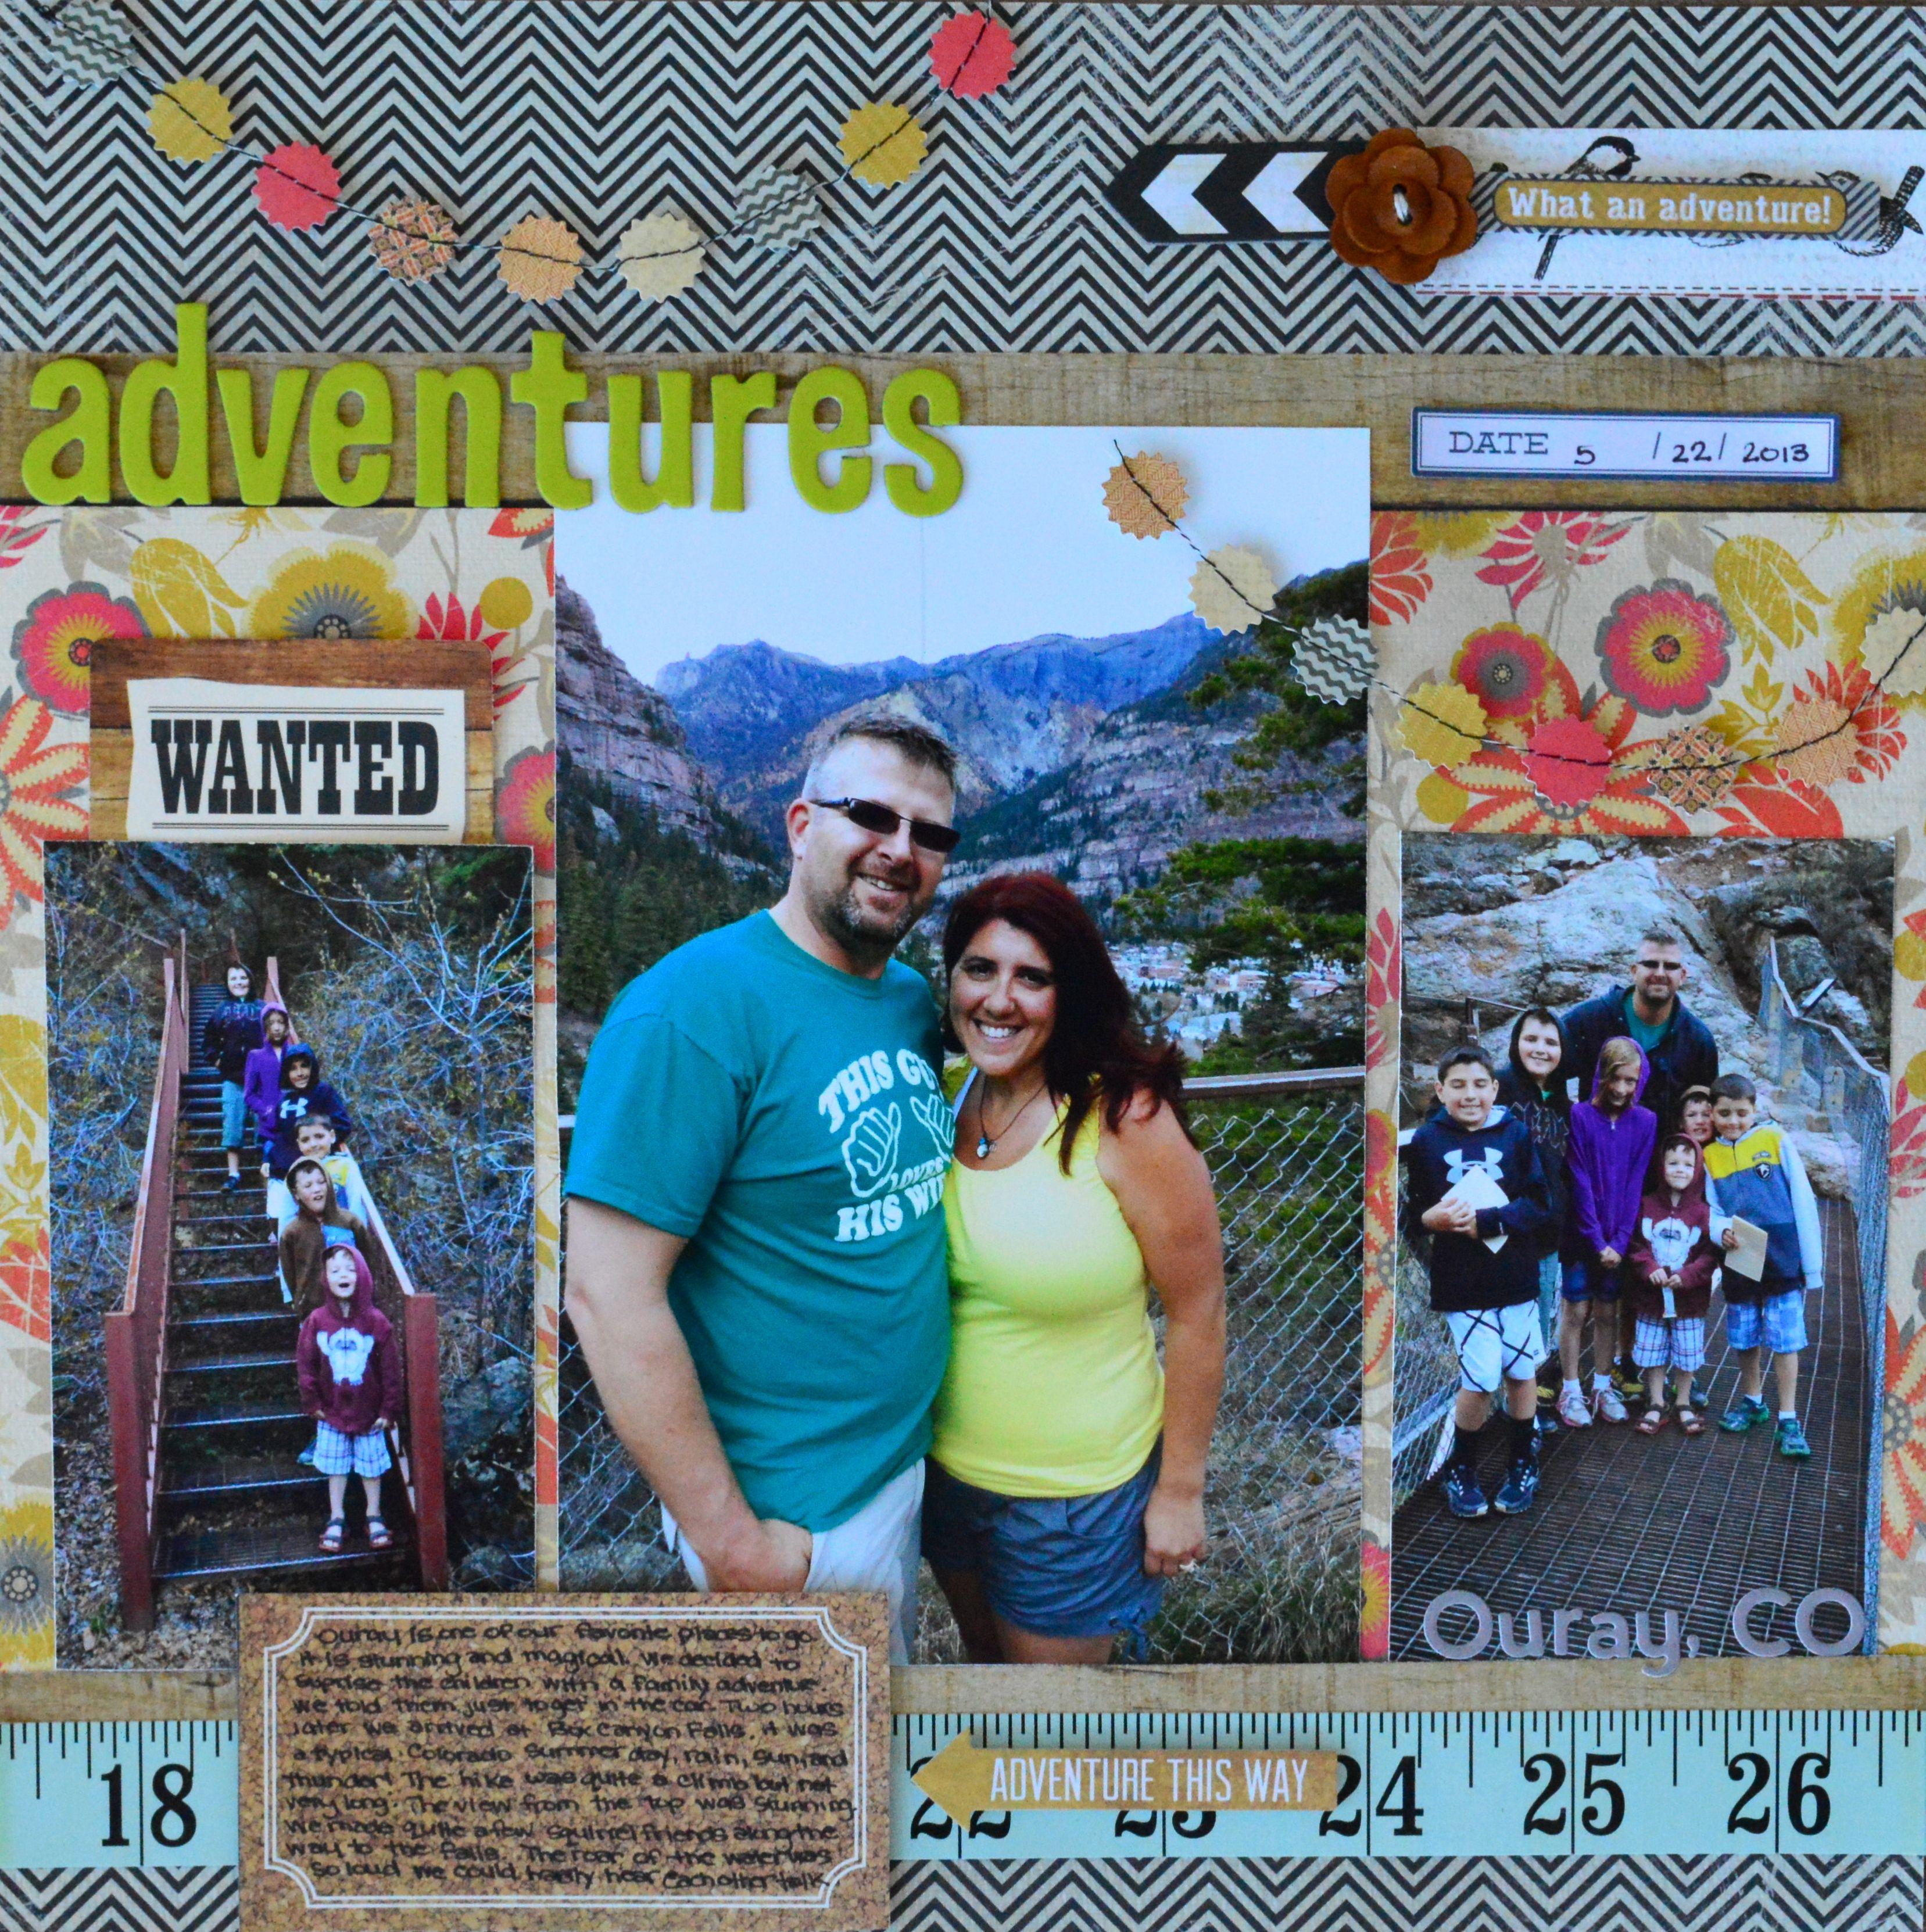 Summer vacation scrapbook ideas - Adventures Wanted Scrapbook Com